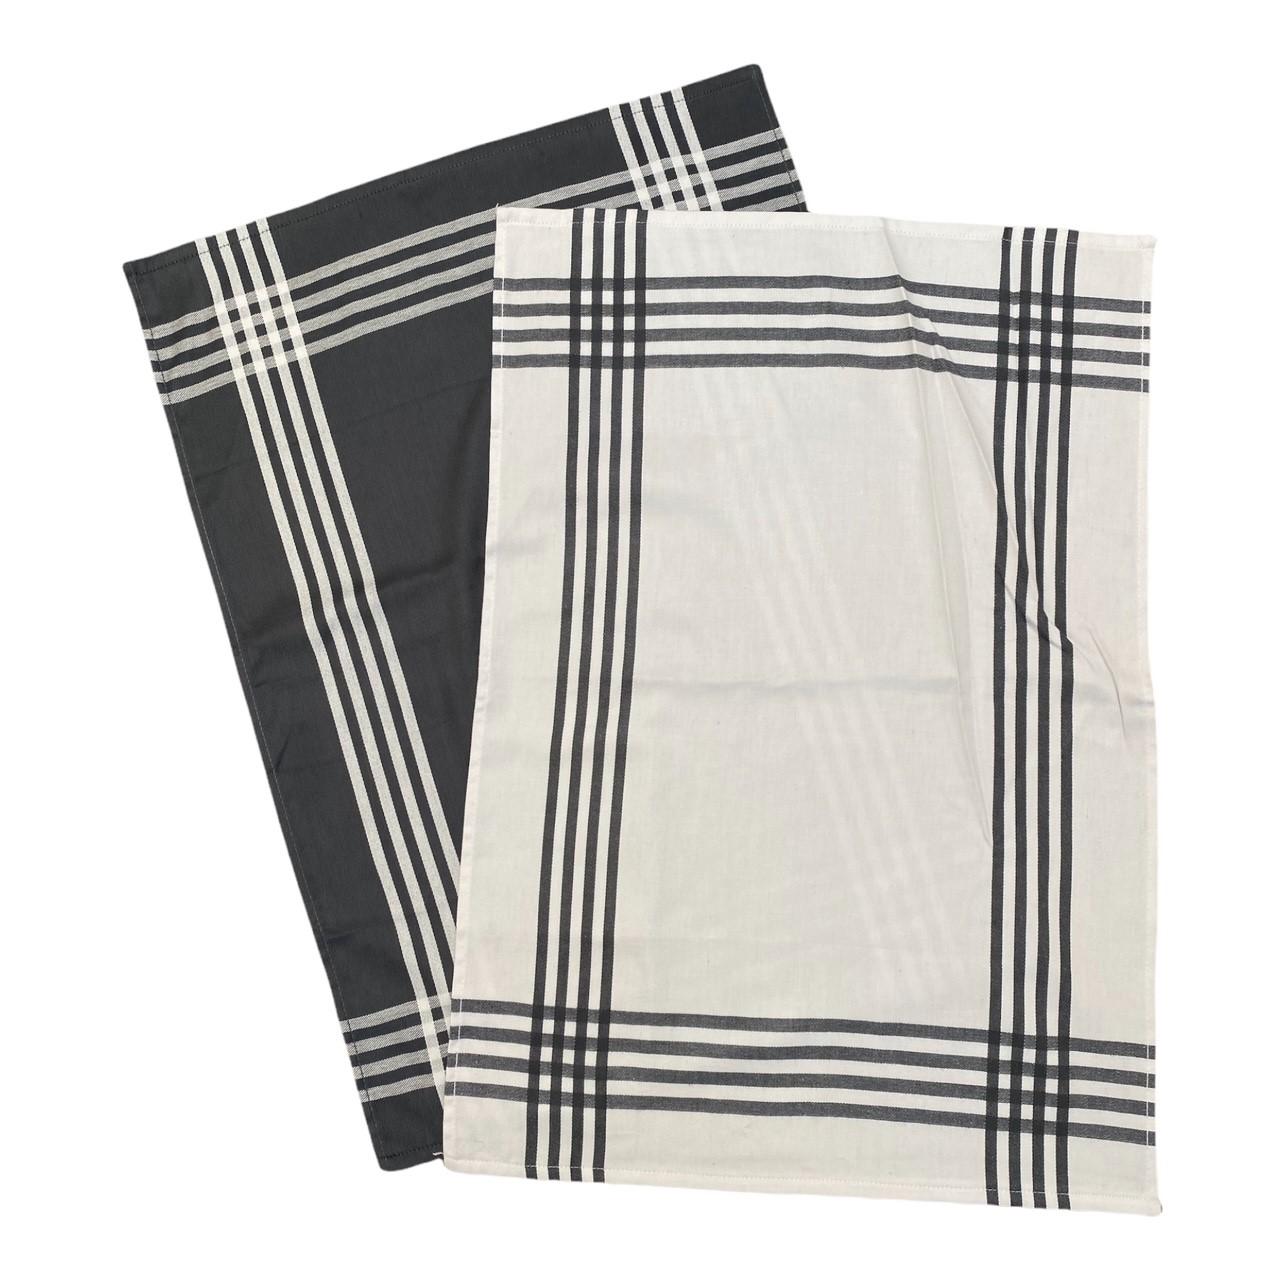 Duo torchons assortis bicolores rayés gris 50 x 70